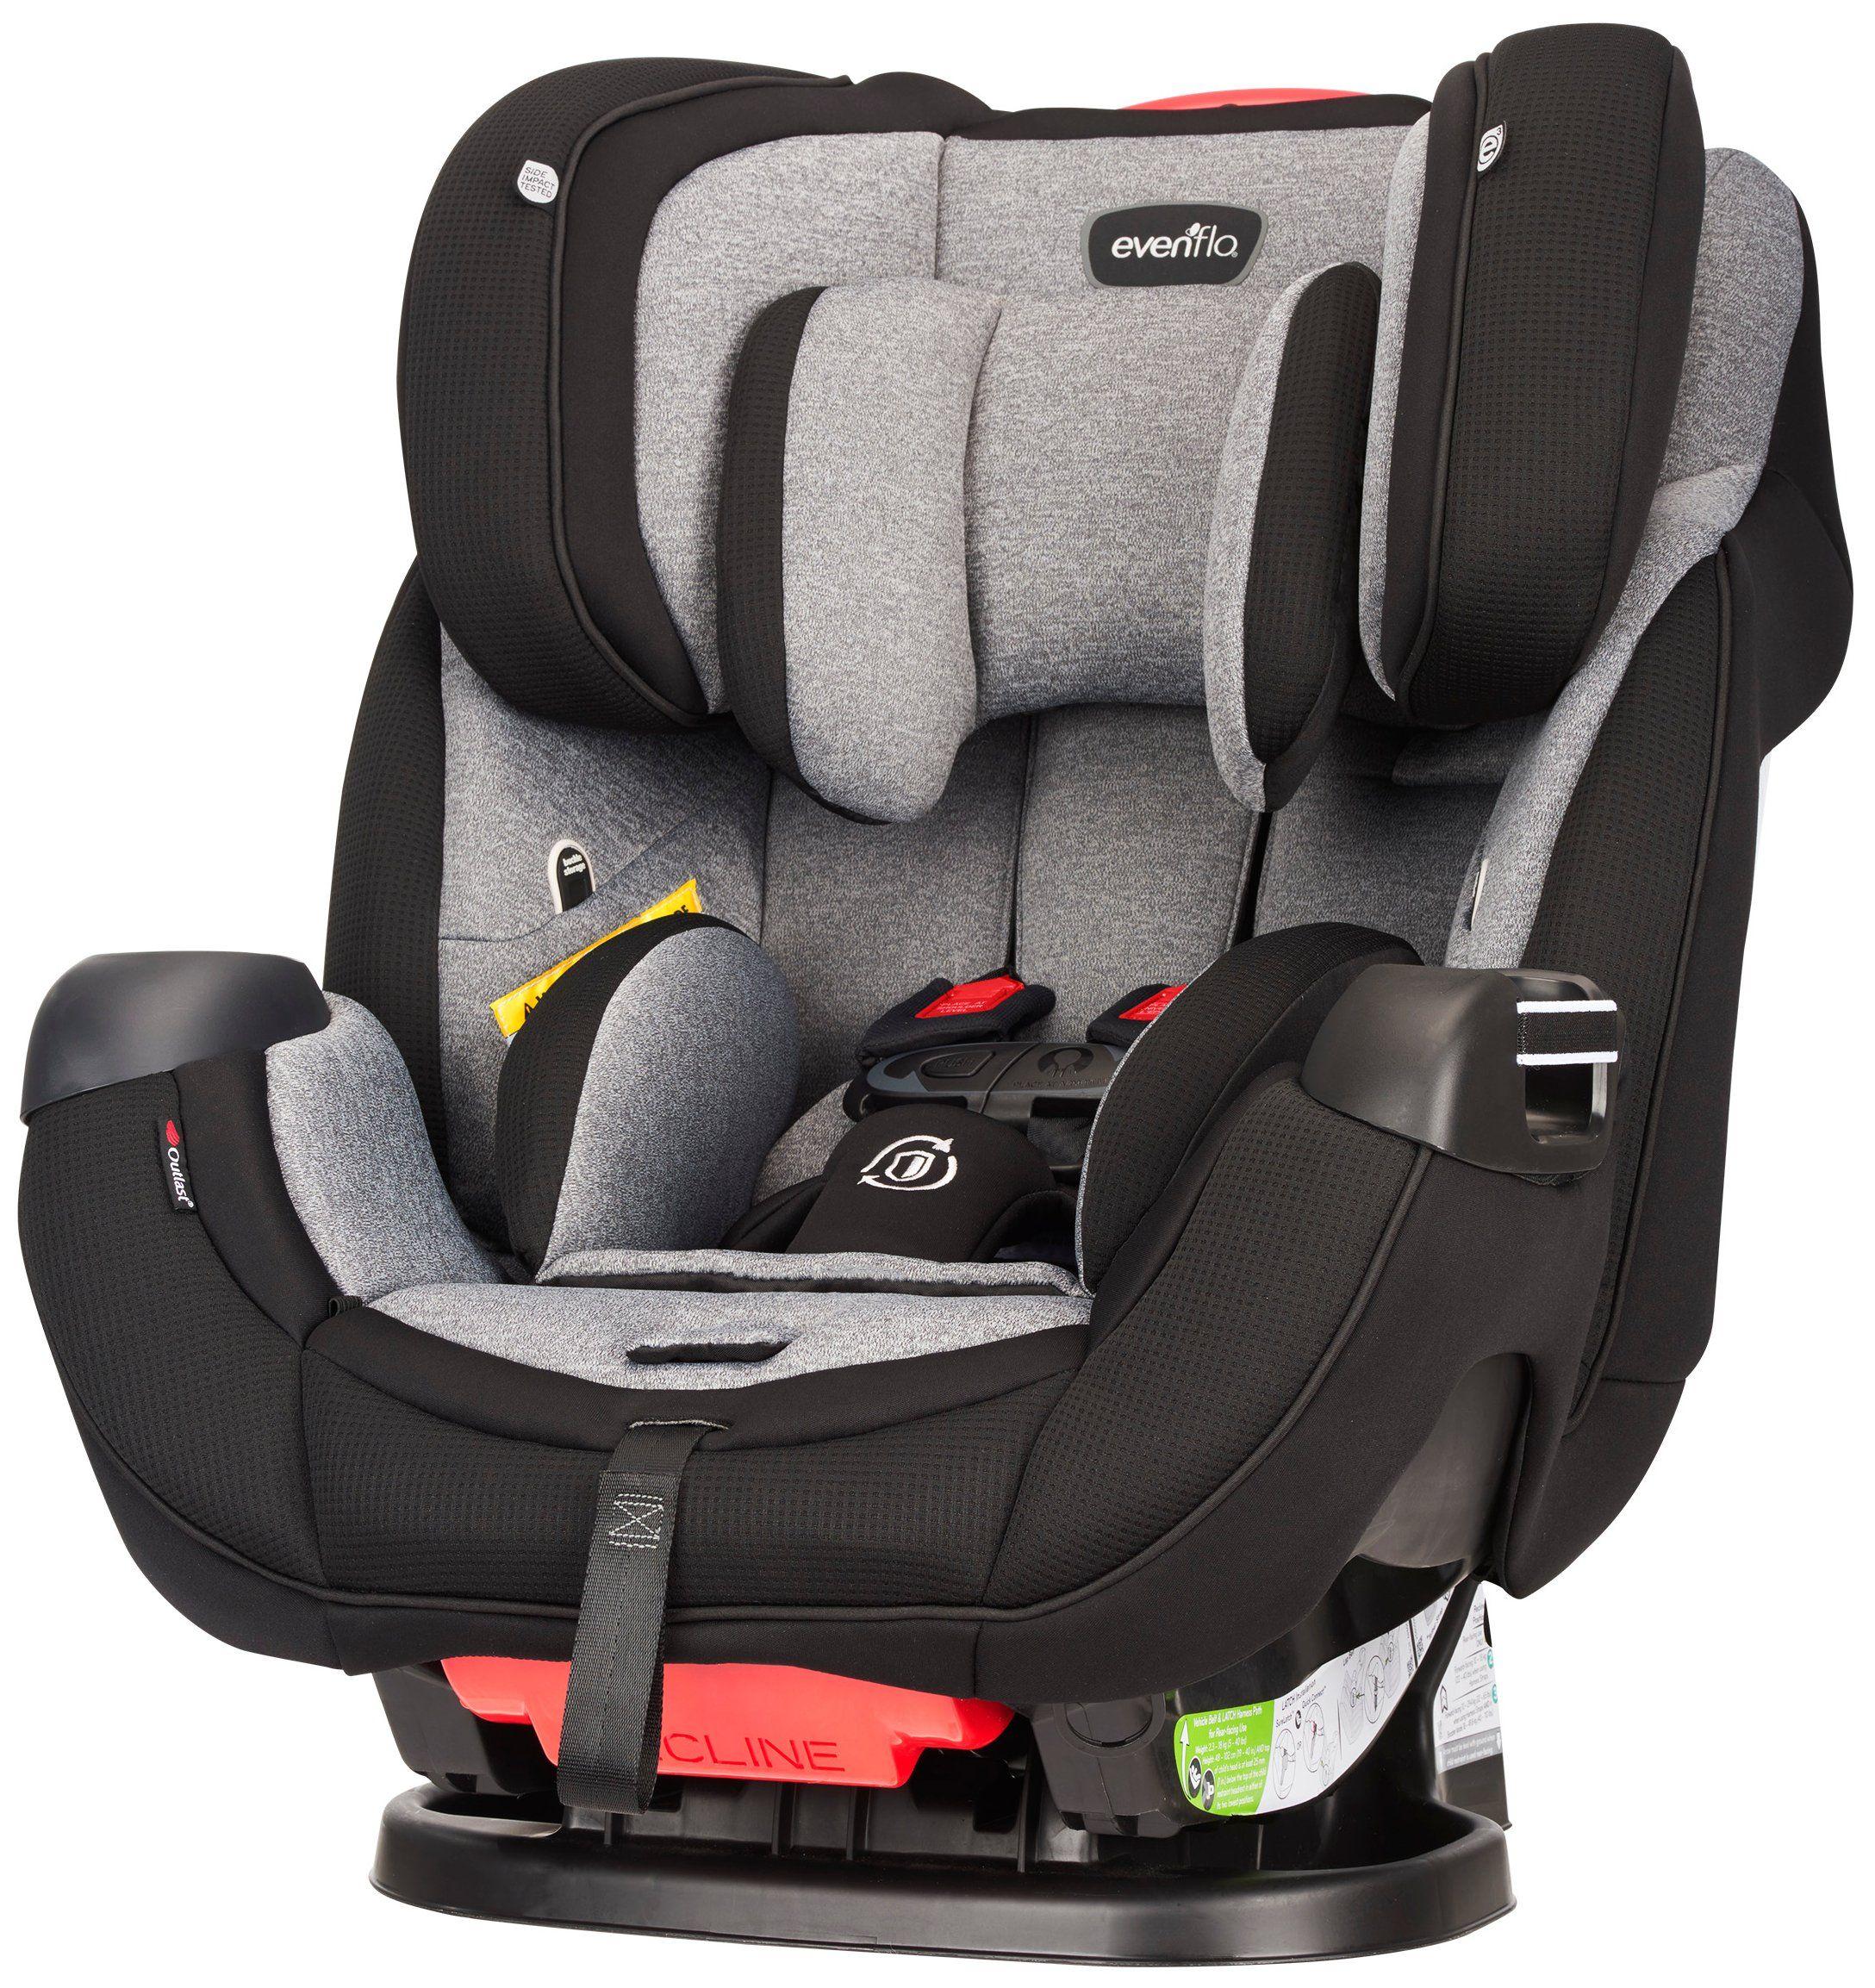 Evenflo Platinum Symphony DLX AllinOne Car Seat (Ashland